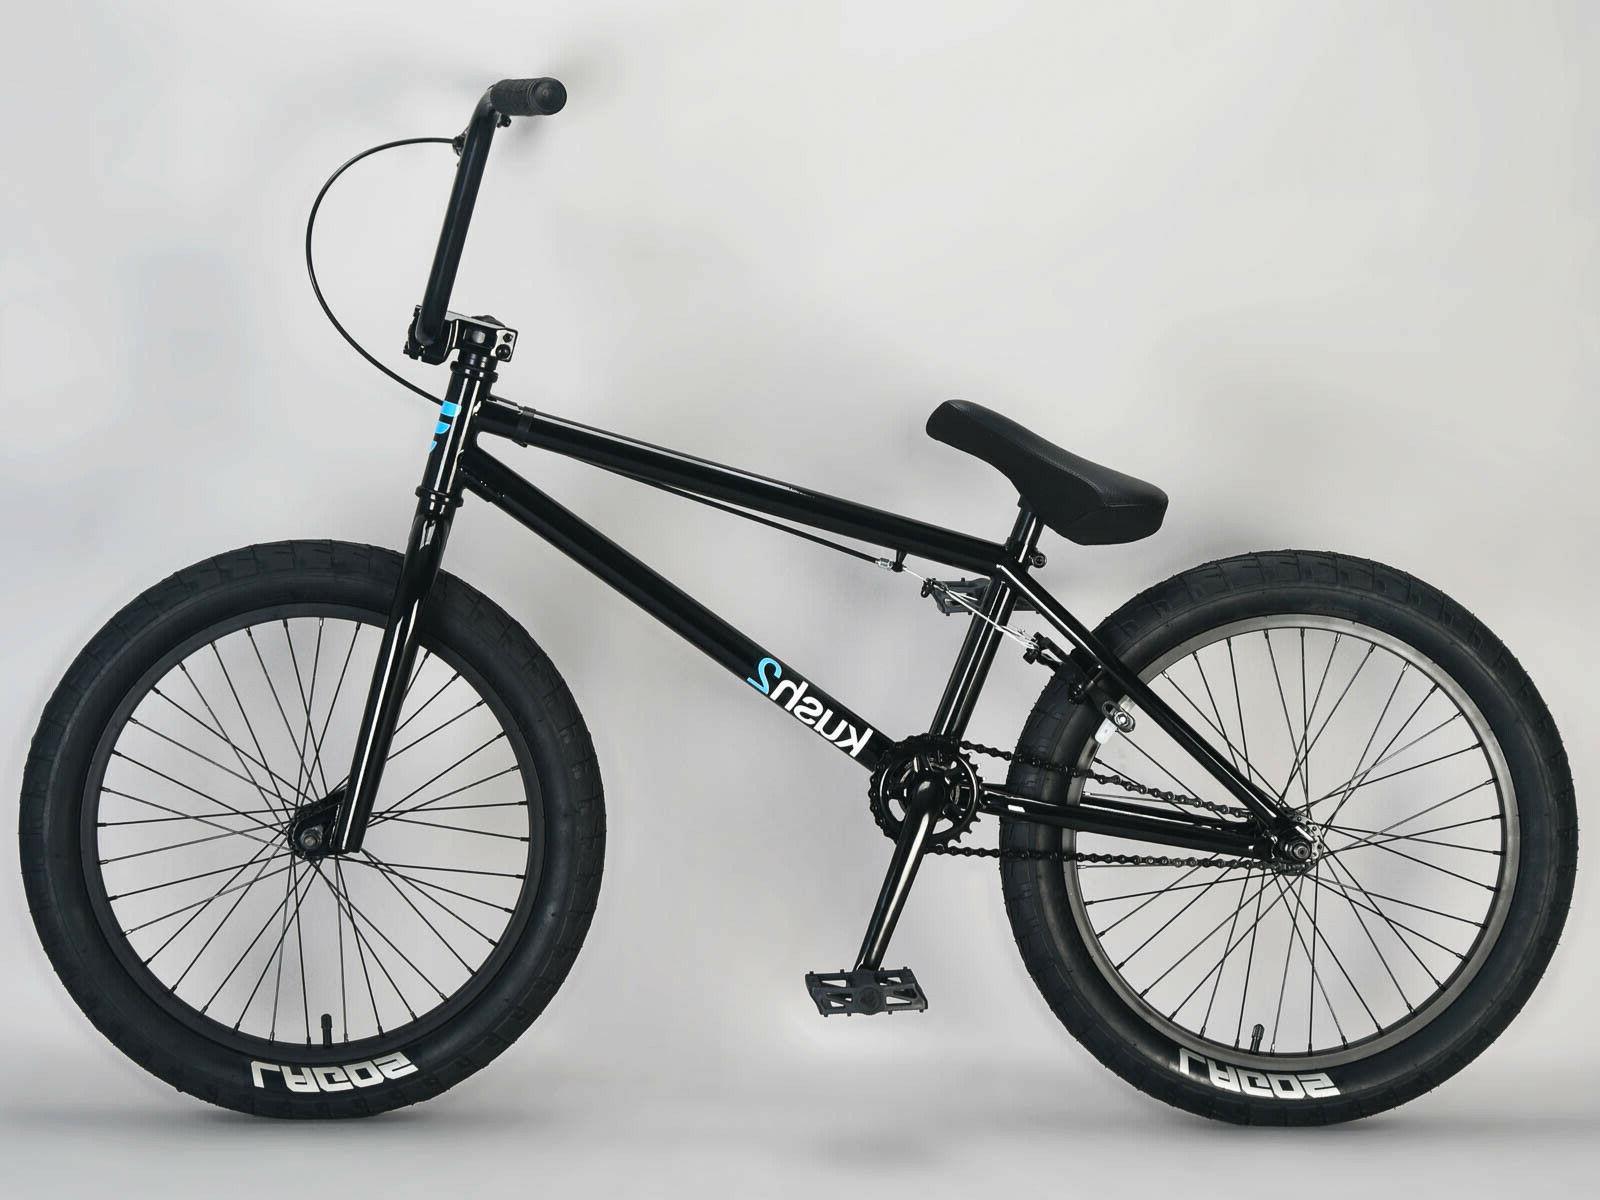 kush 2 20 inch bmx bike multiple